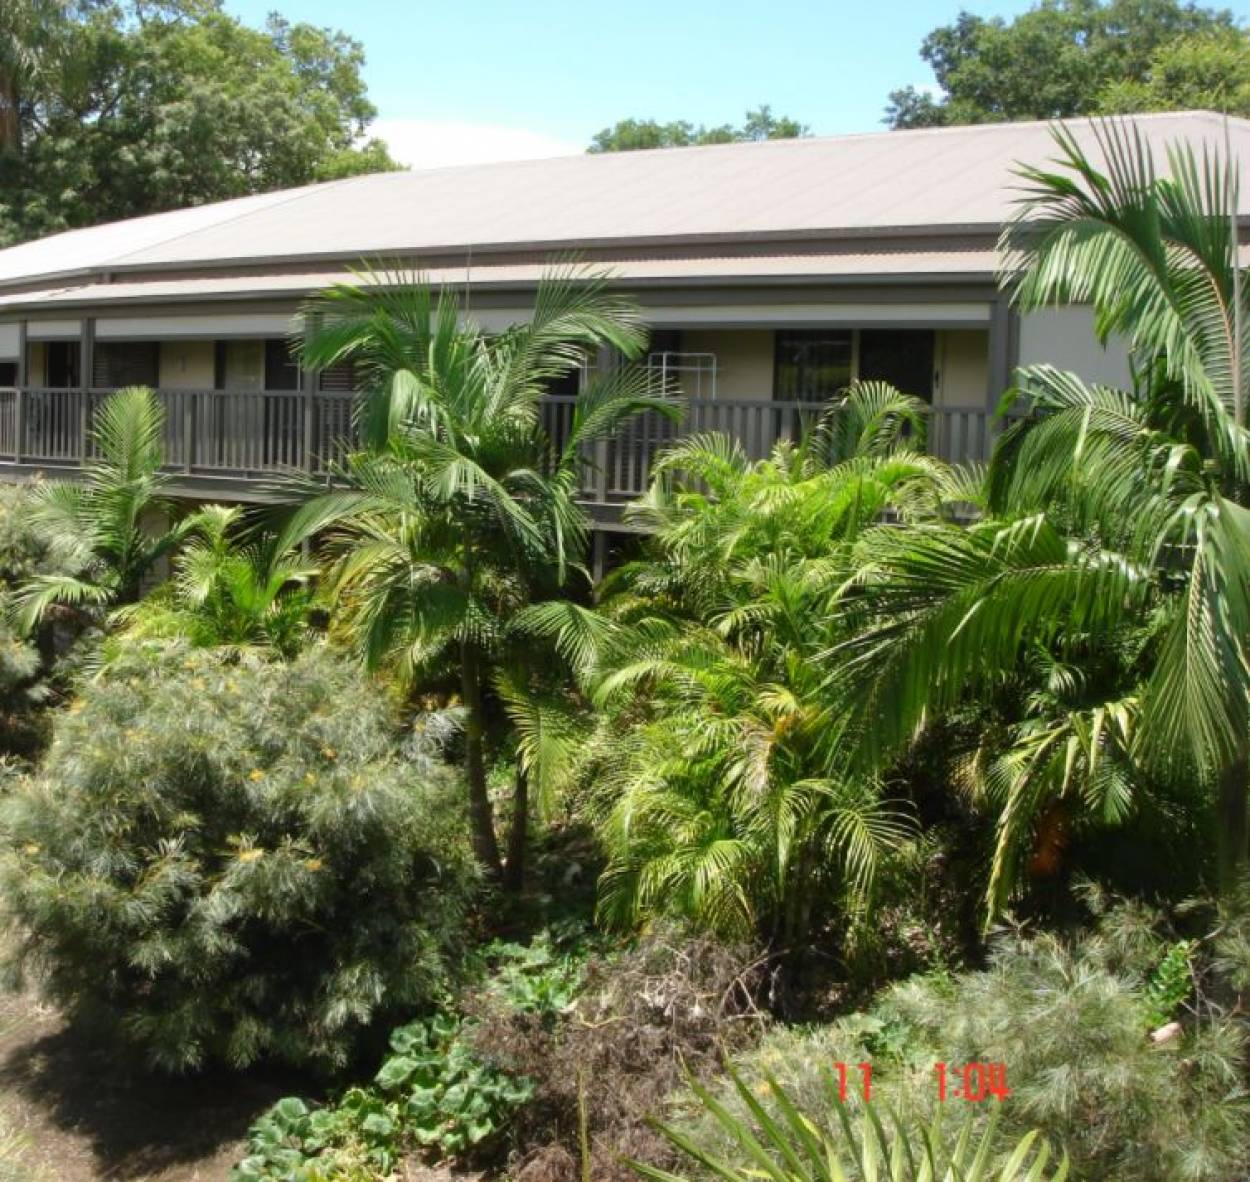 Eureka Freshwater Villas Gympie 1-15 Ada Street - Gympie 4570 Retirement Property for Rental